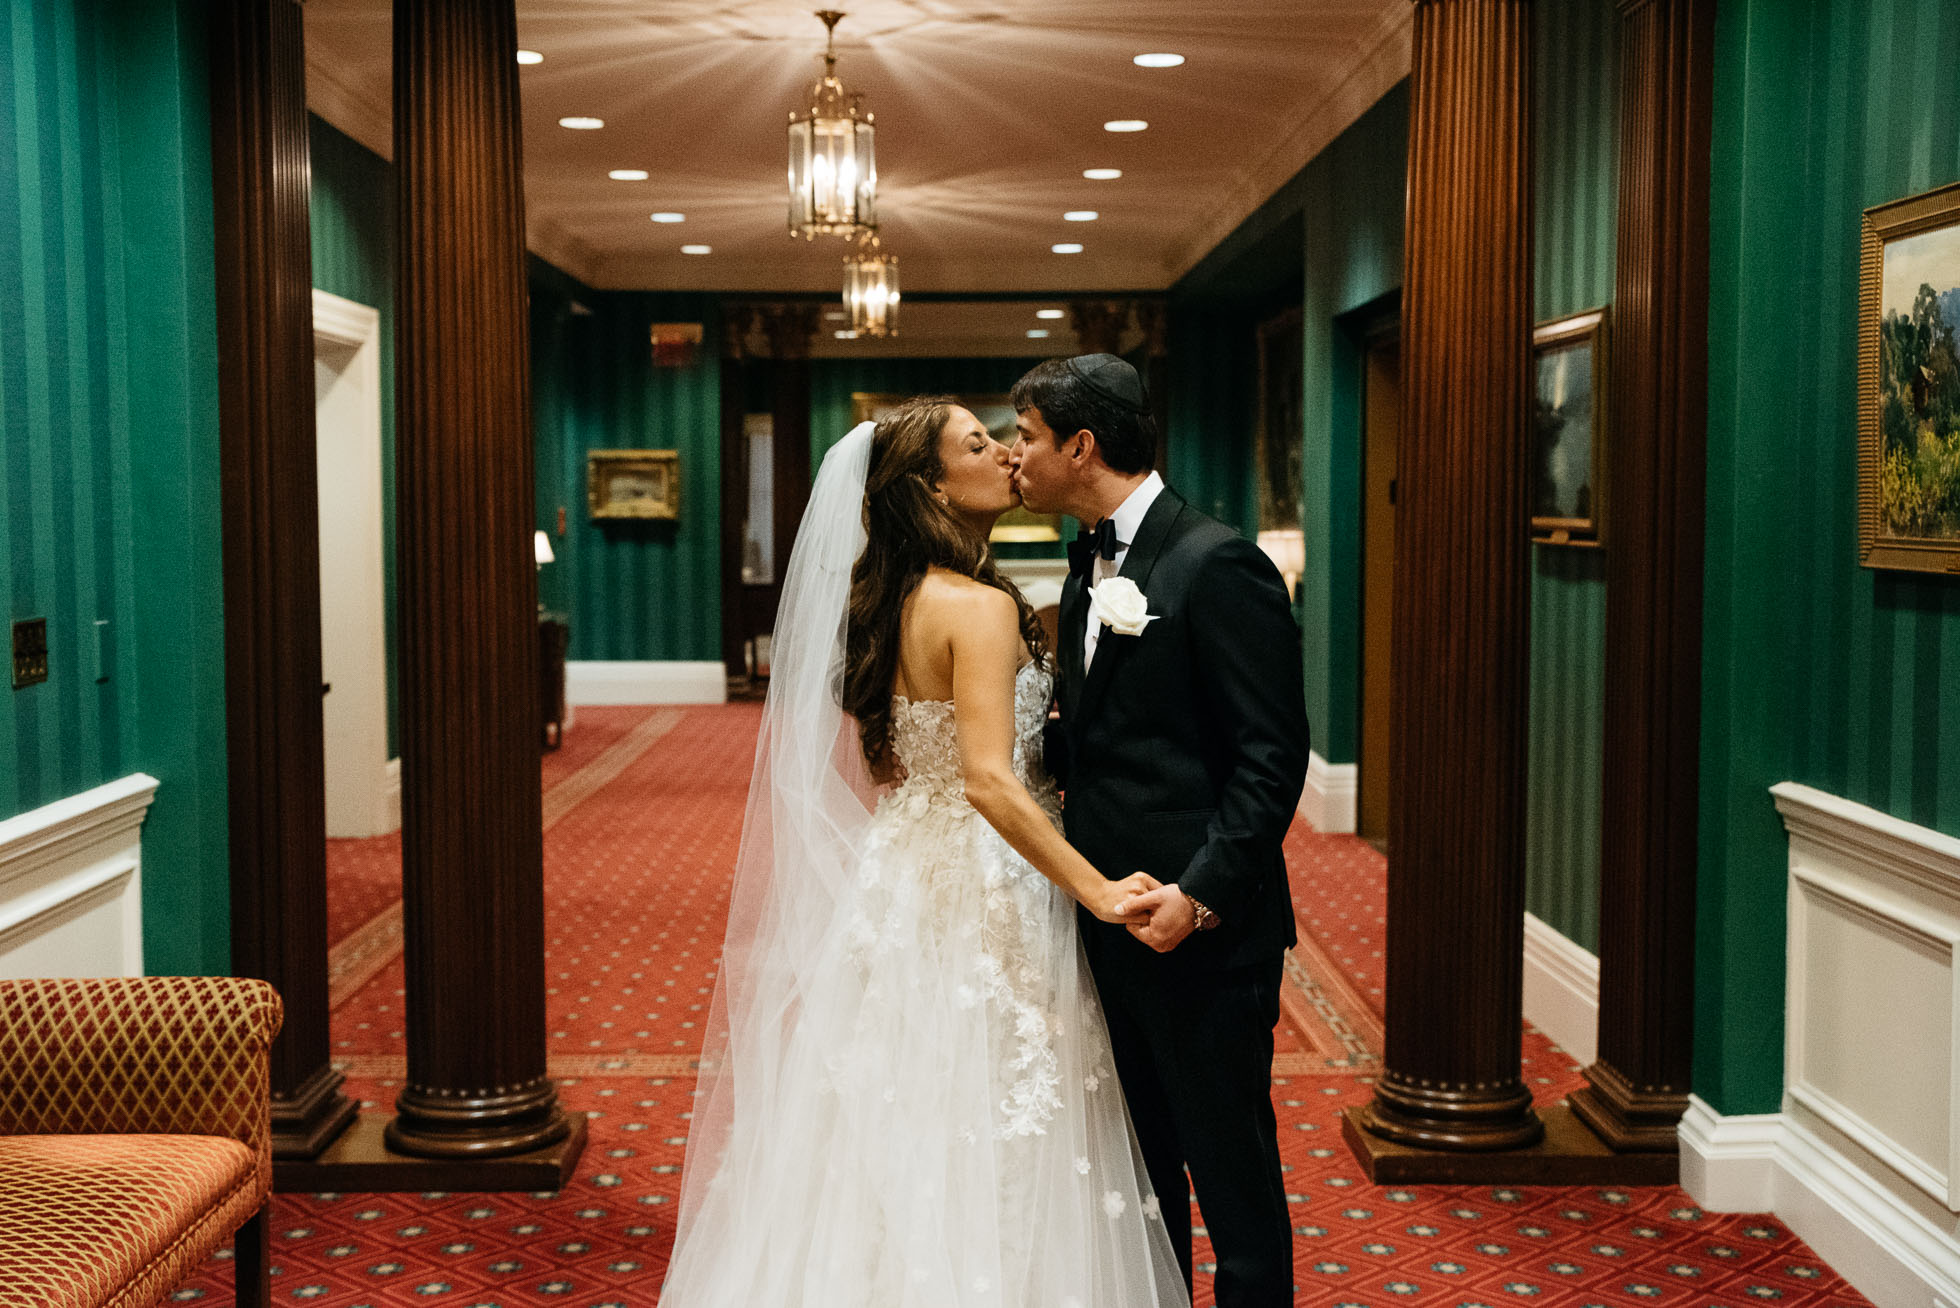 Duquesne Club wedding photography, Pittsburgh PA, Mariah Fisher-19.jpg